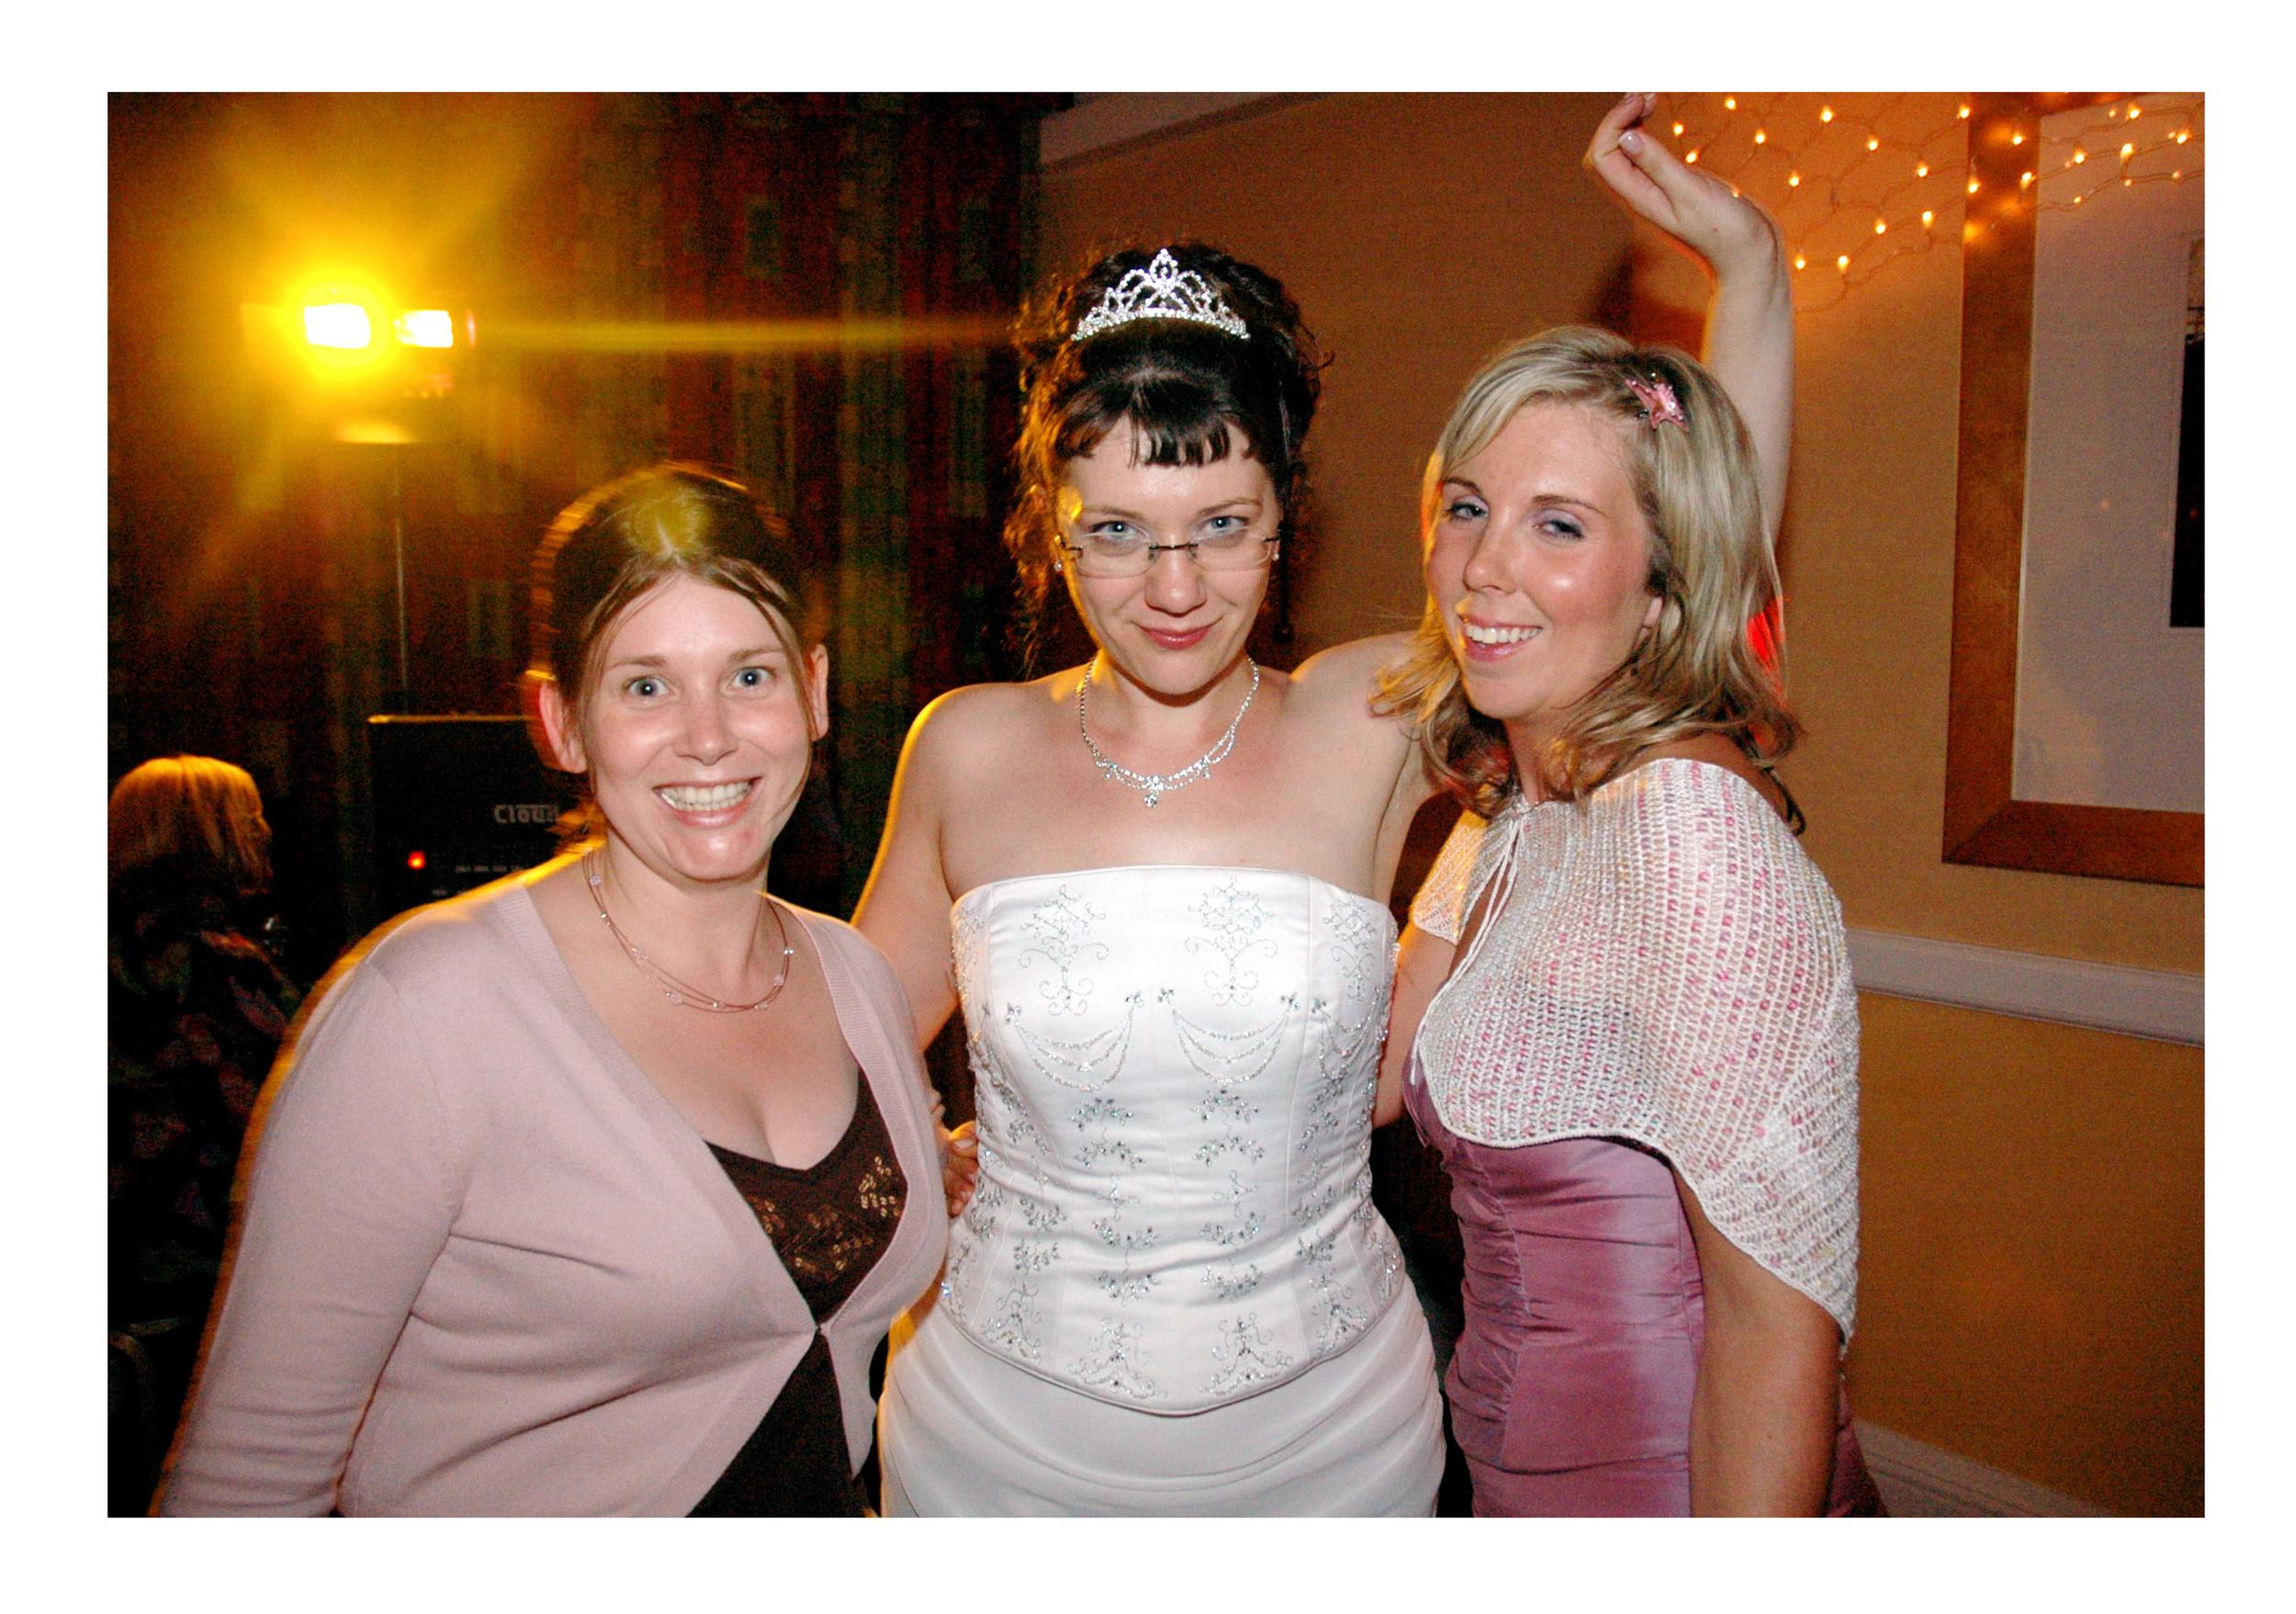 REPORTAGE-WEDDING-PHOTOGRAPHY-SET-UK-79.jpg